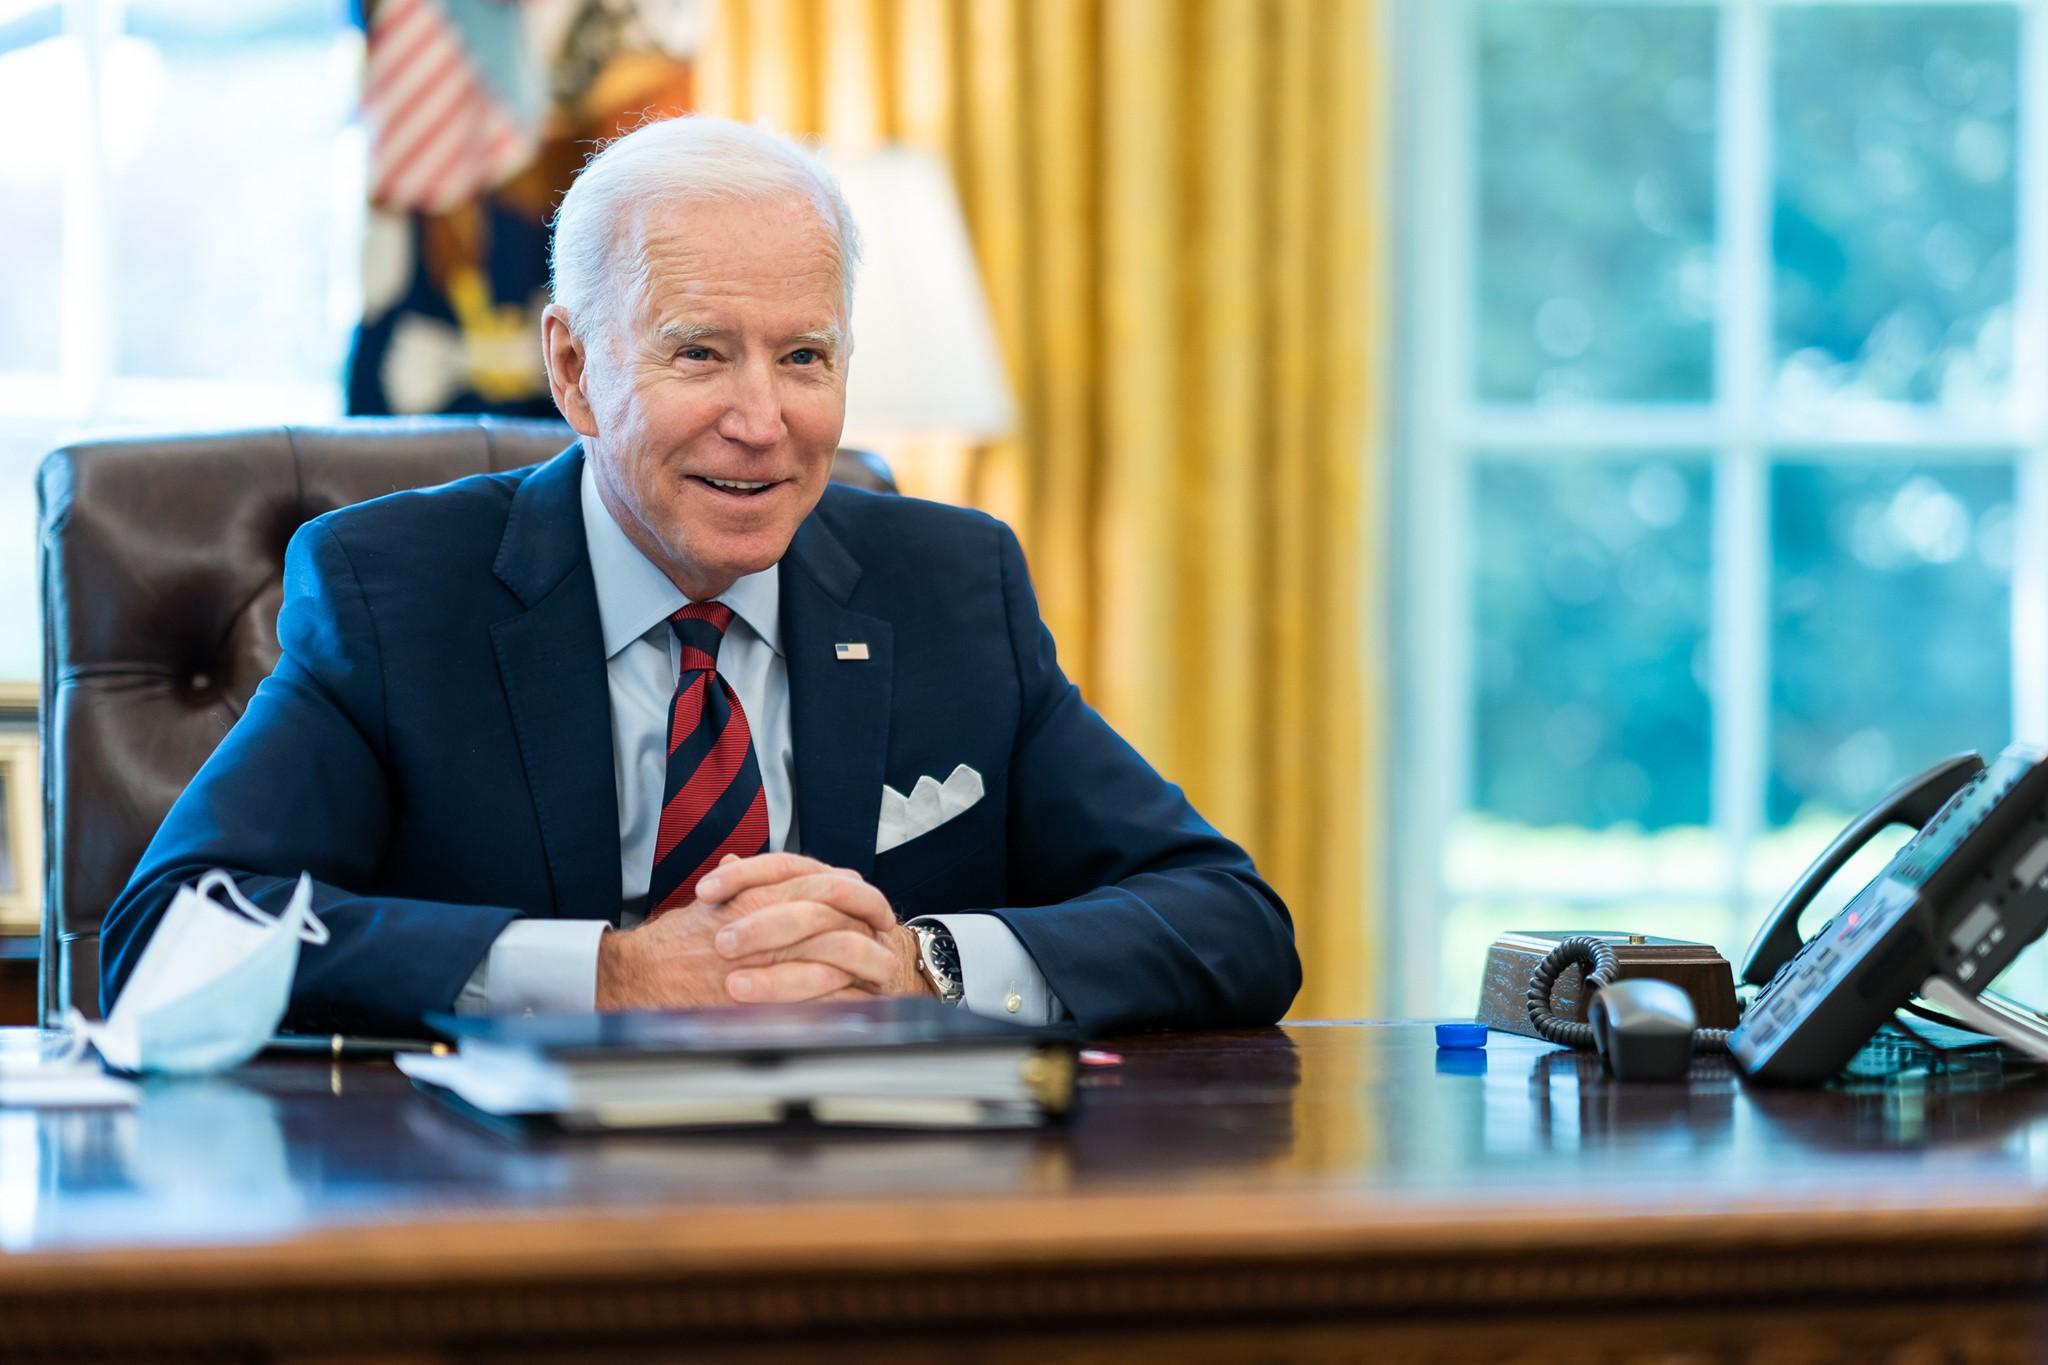 File photo courtesy: Facebook/The White House